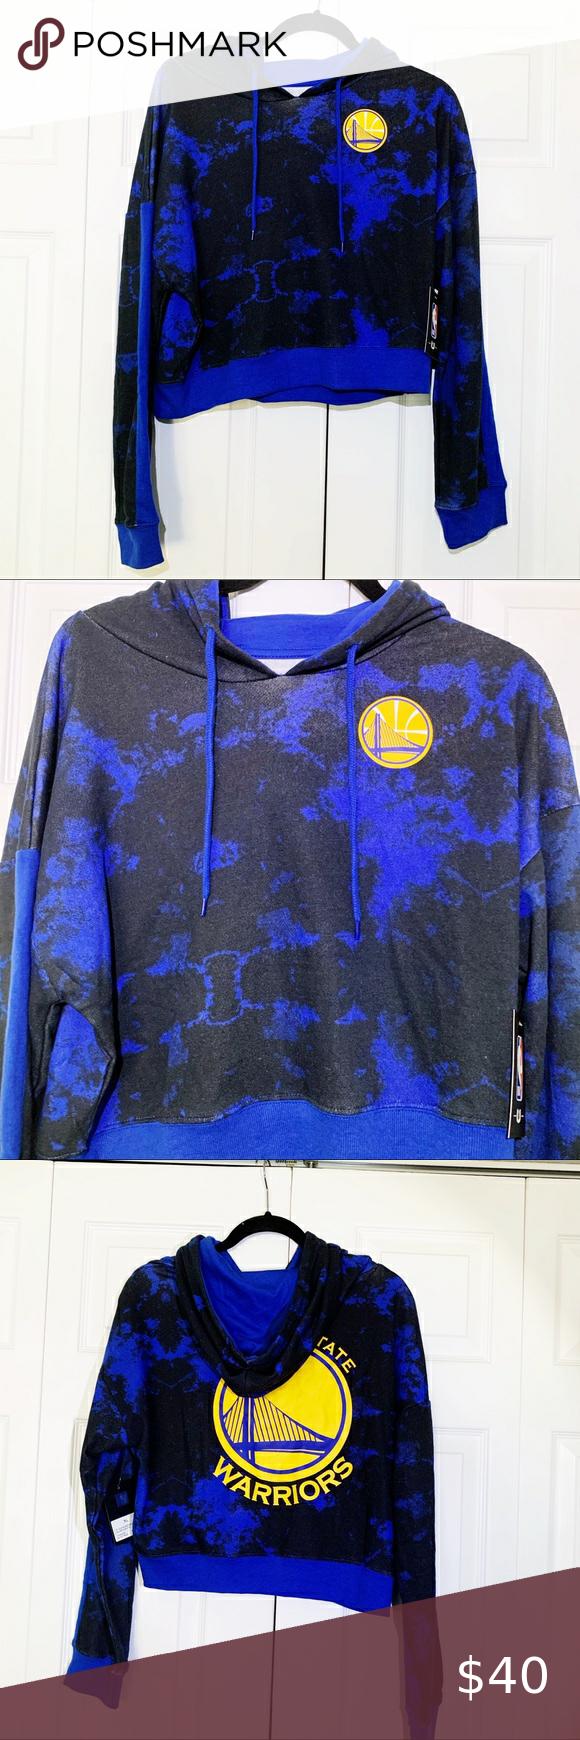 NWT Golden State Warriors Blue Tie Dye Sweatshirt NWT in